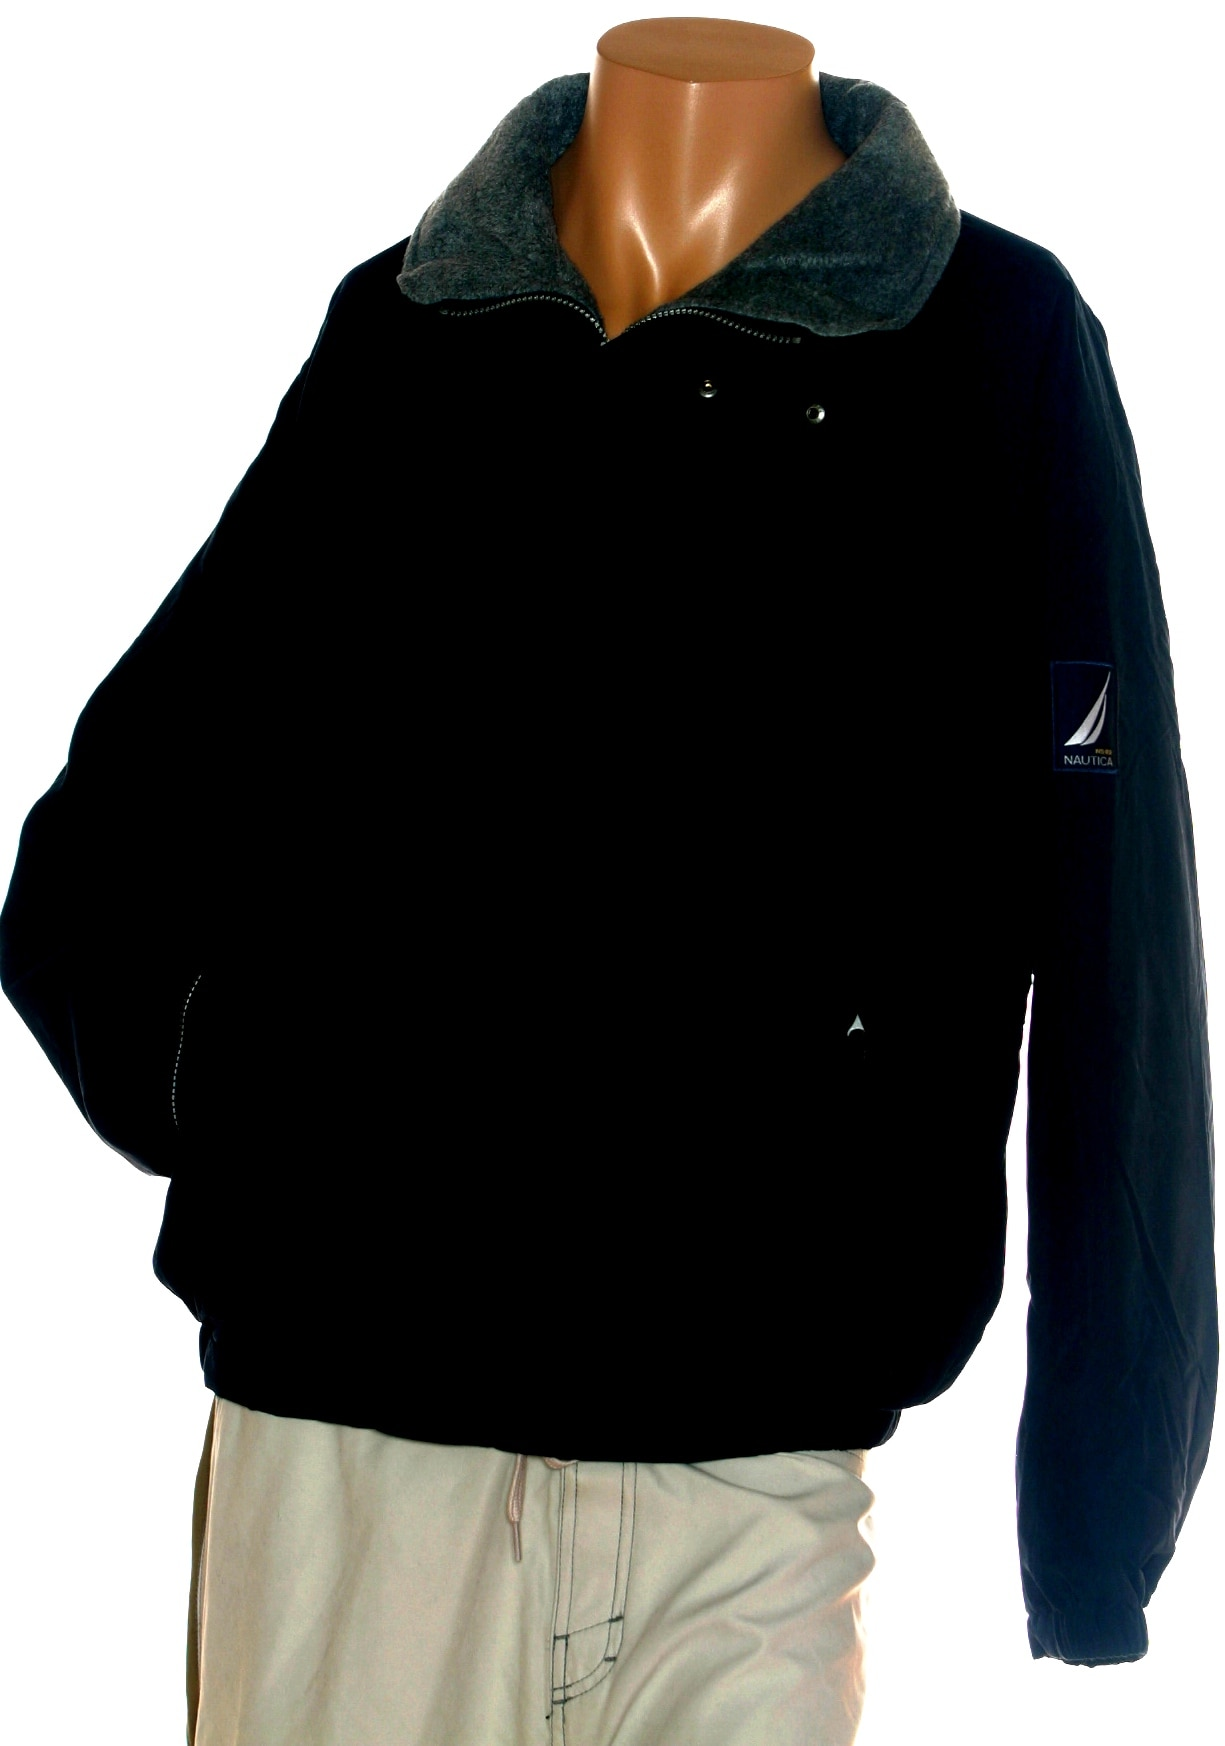 Nautica Mens Coastal Jacket Overstock Shopping Big